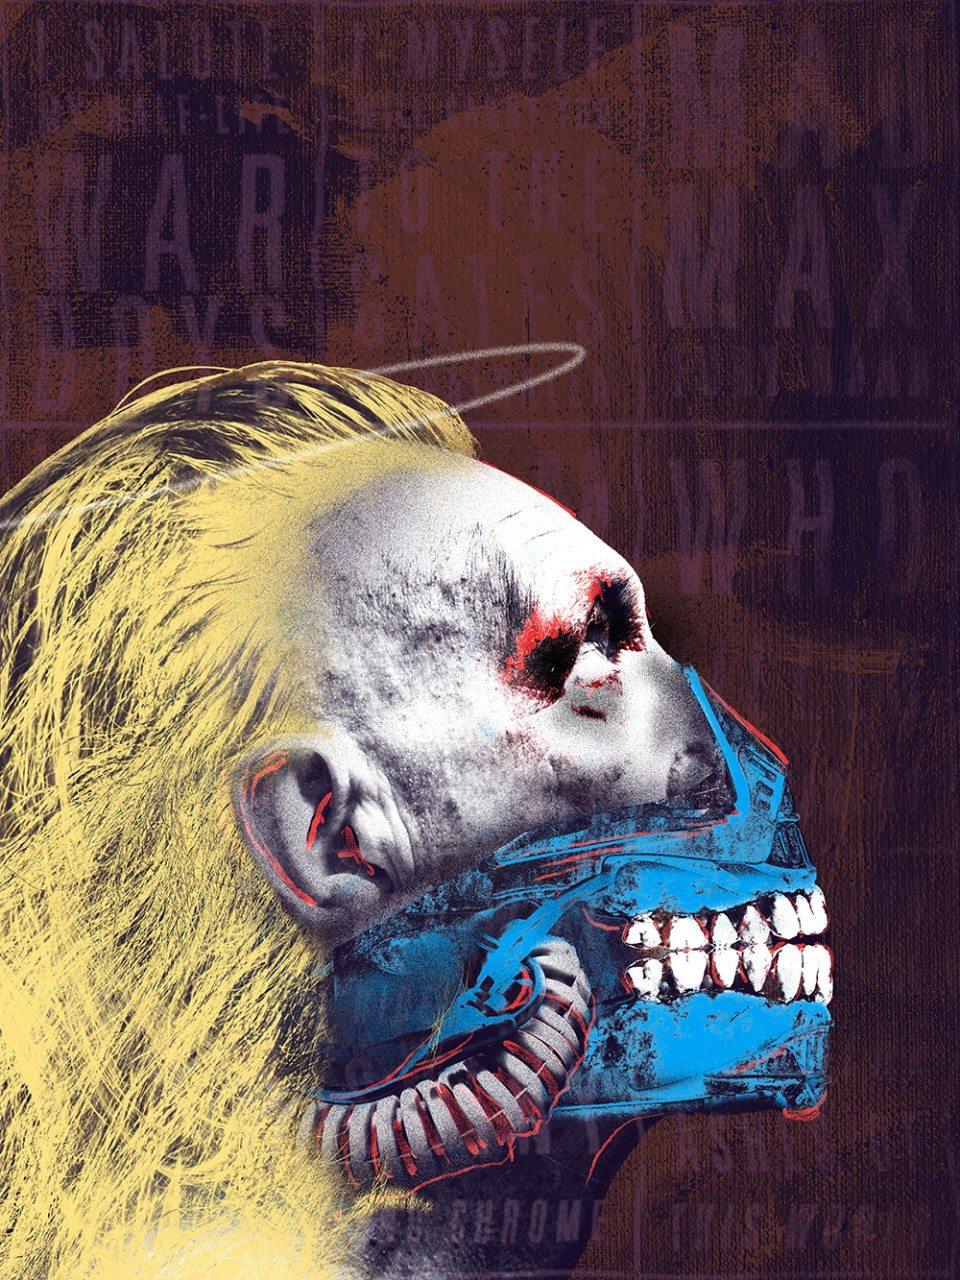 Mad Max: Fury Road, Jordan Roland (İlham kaynağı: Andy Warhol)